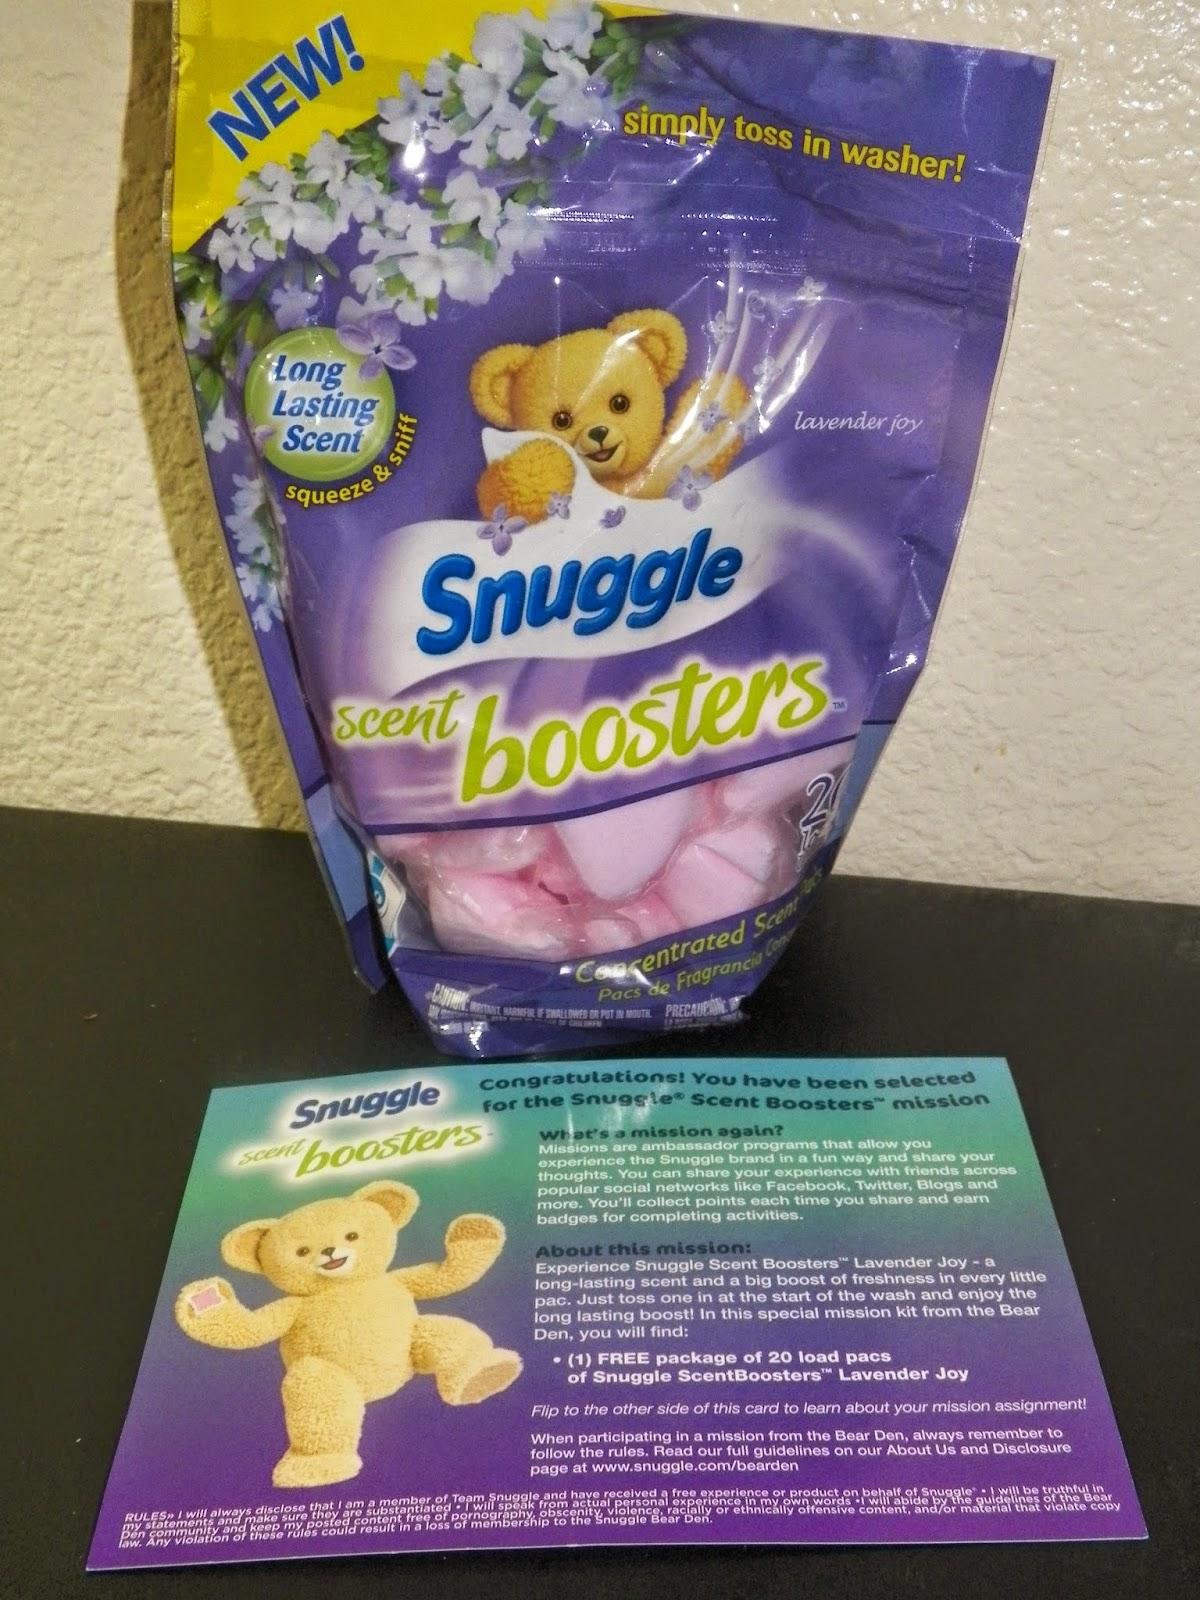 SnuggleScentBoosters.jpg